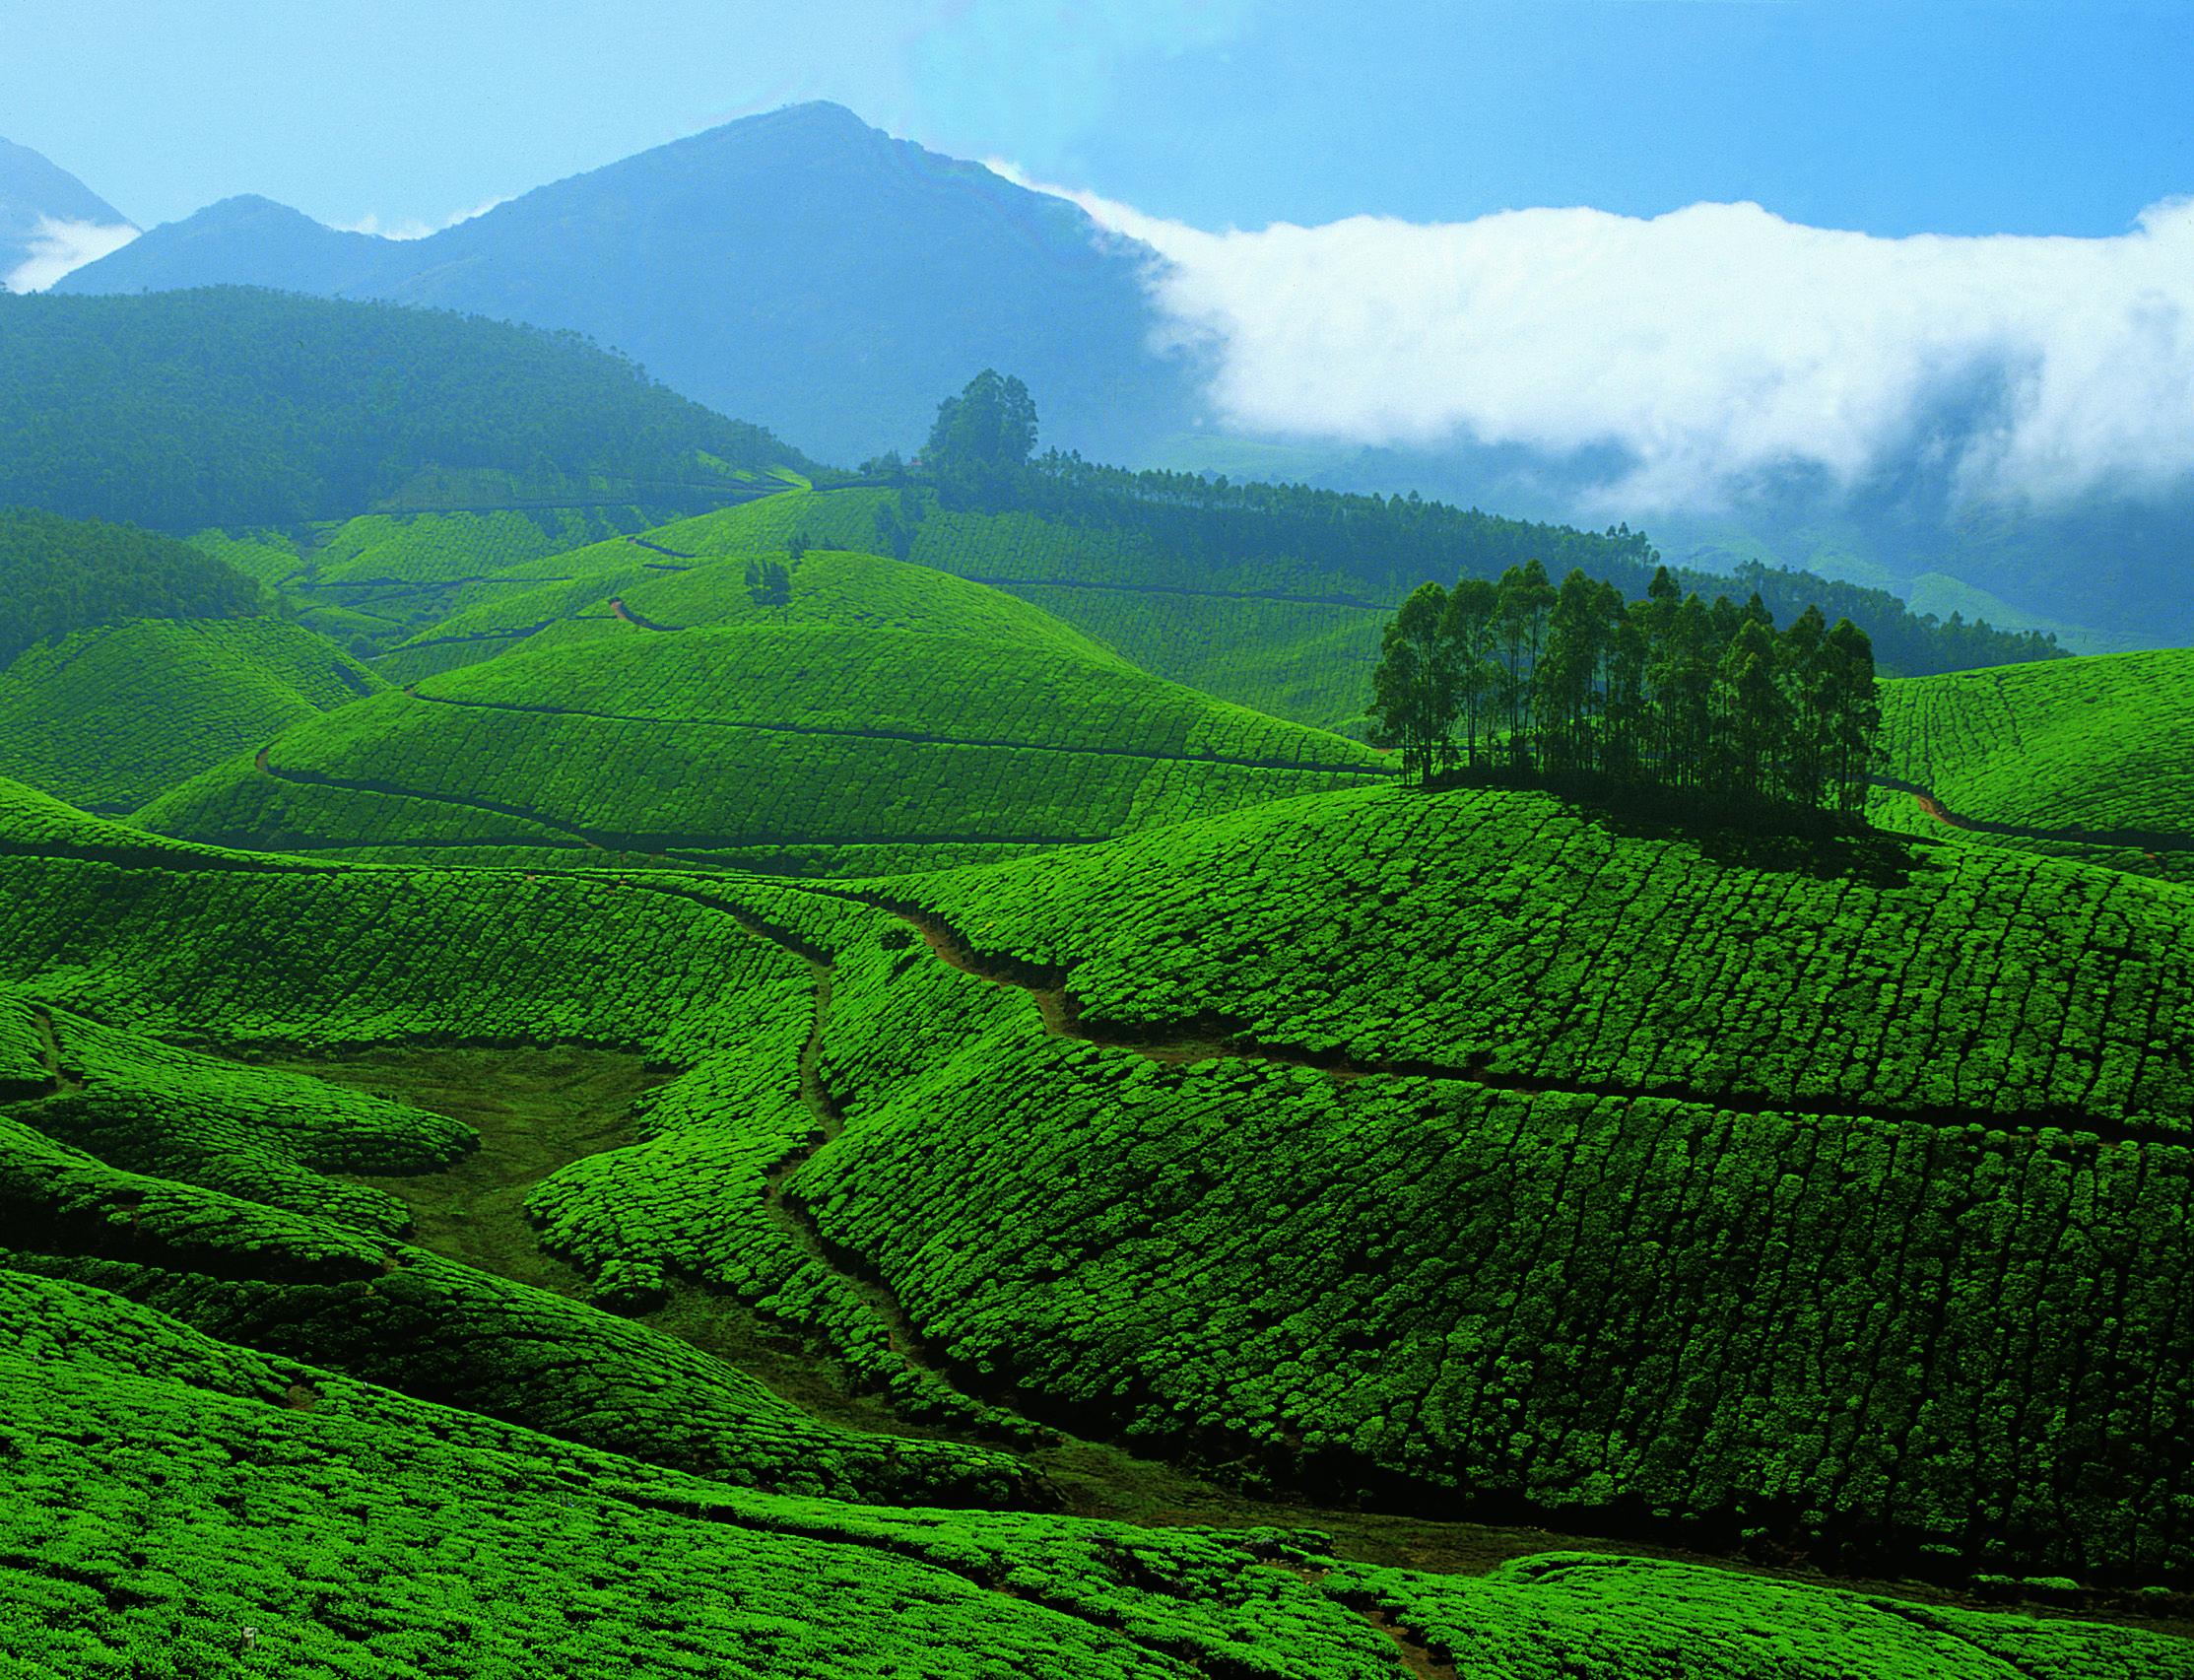 This is Kolukkamalai Tea Estate in the Munnar region of